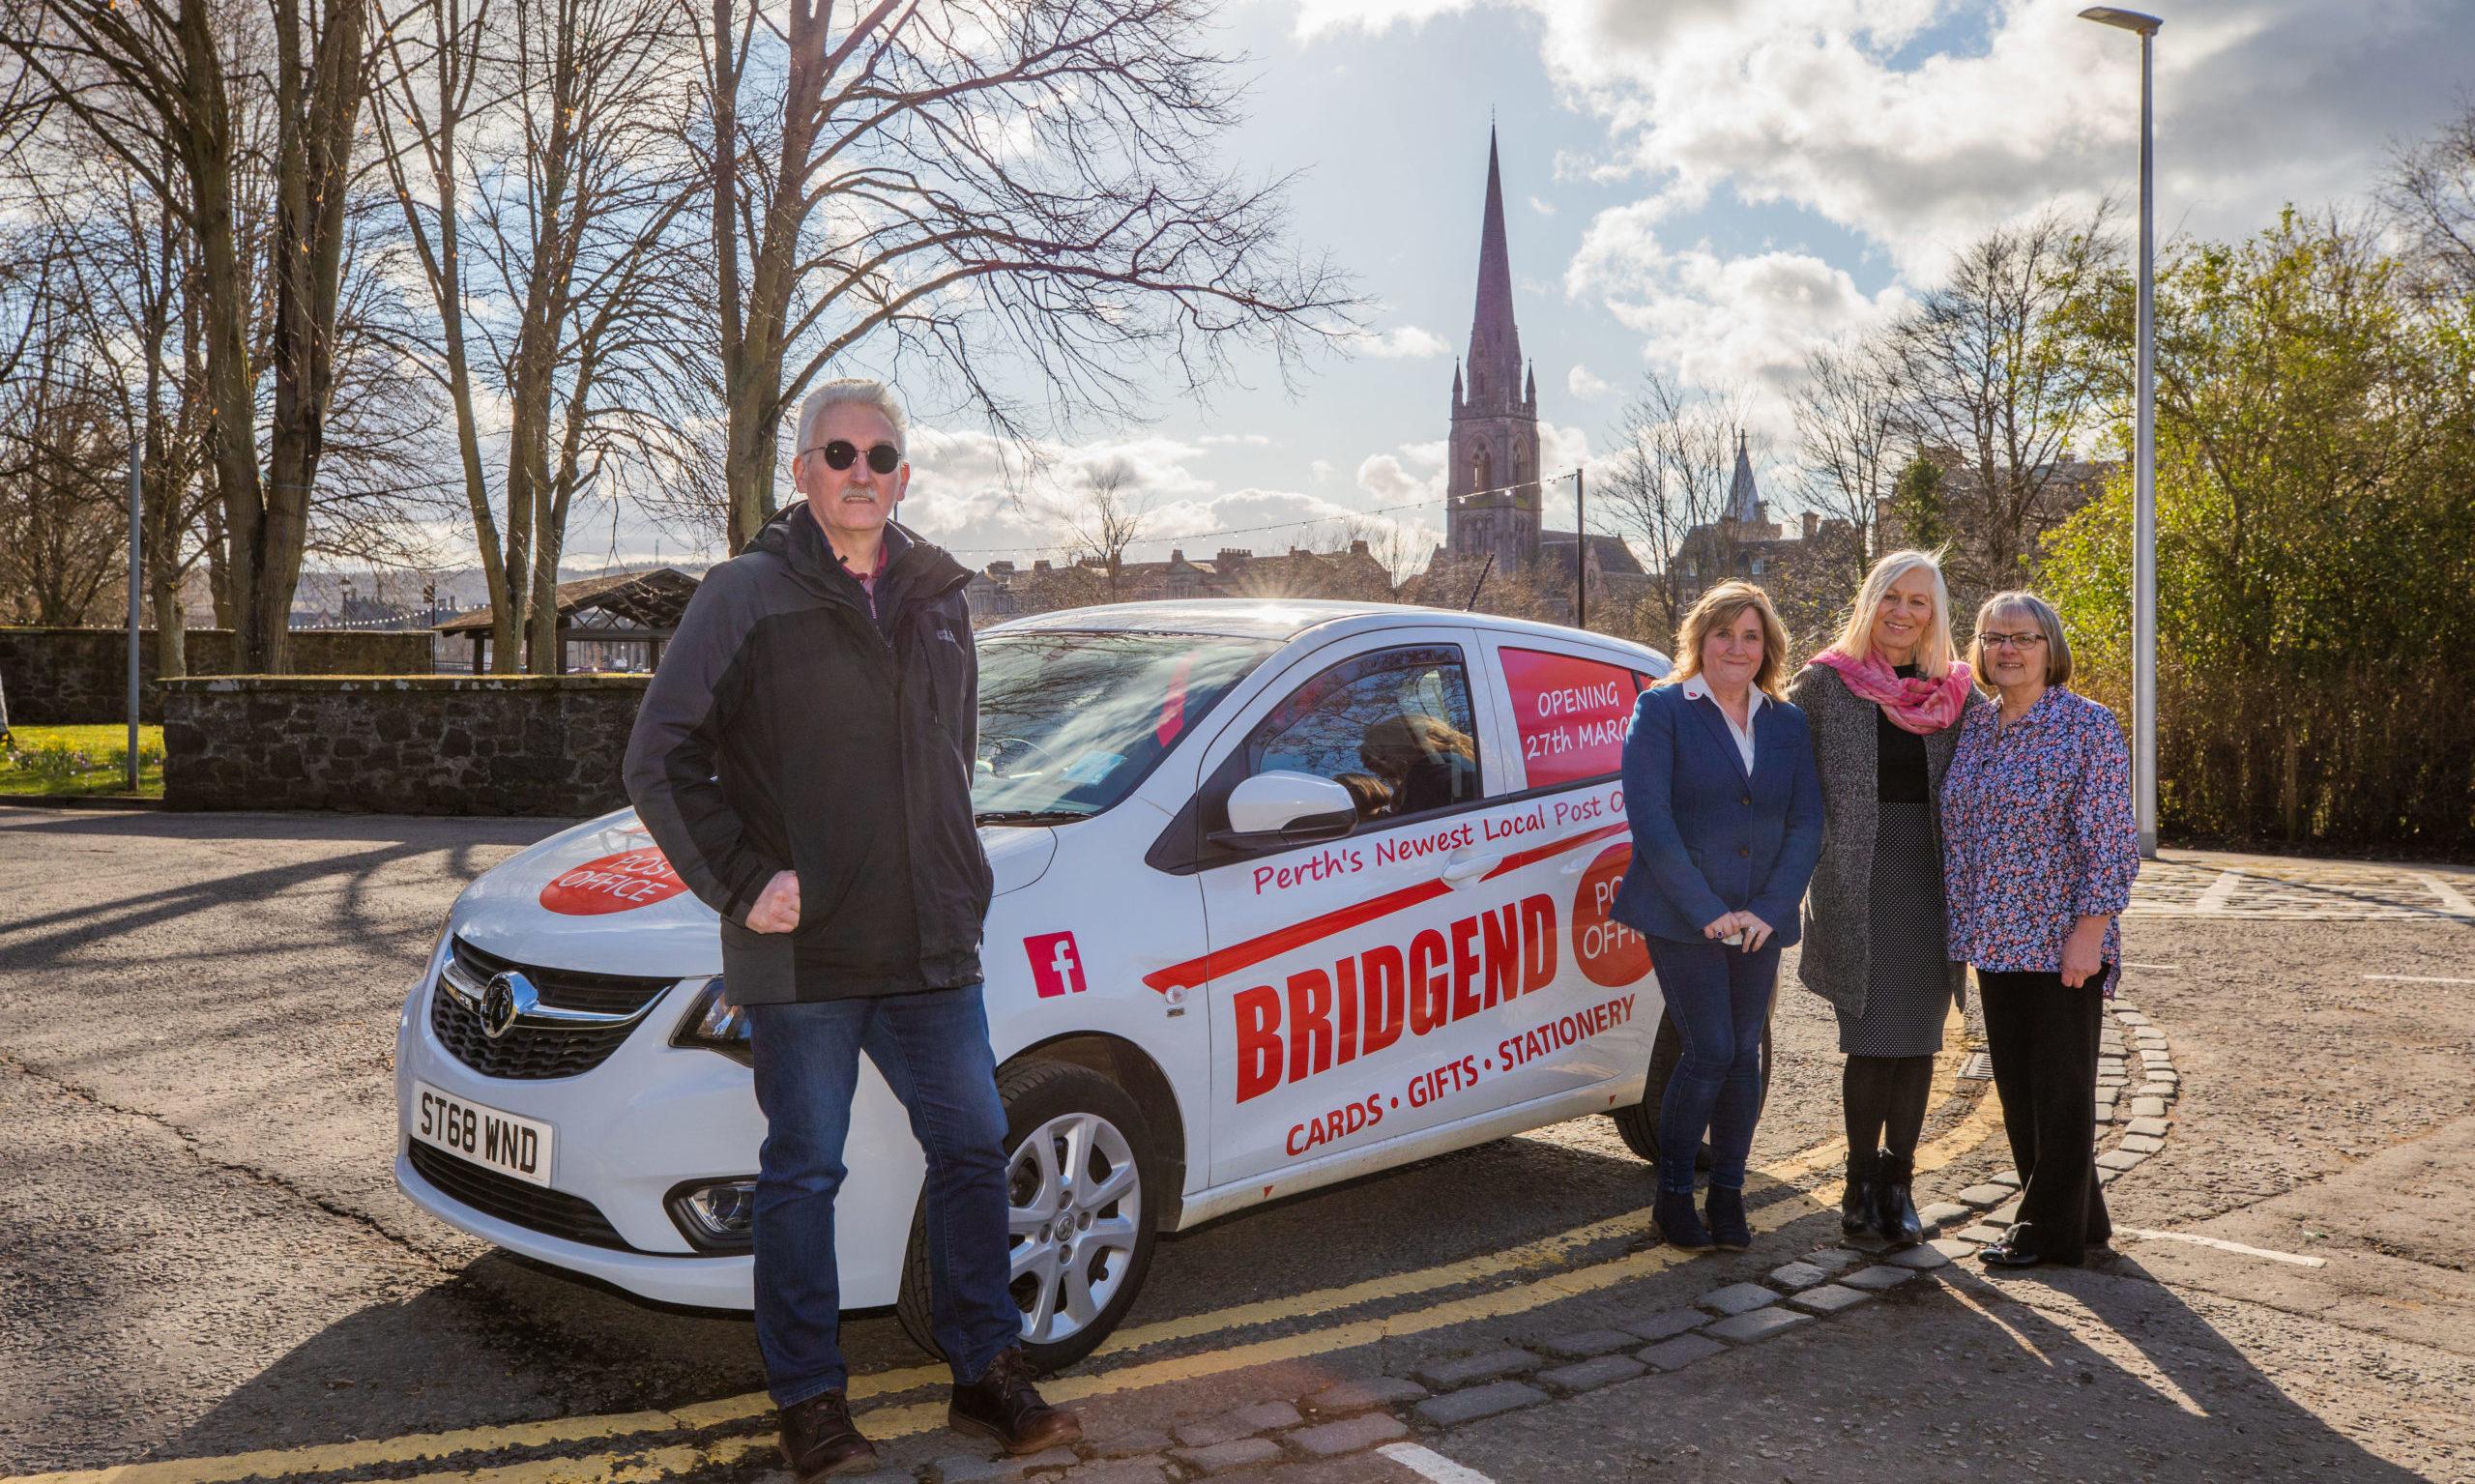 Ian Morgan, Linda McDonald, Edna McIntyre and Fiona Bain are preparing to open the new Post Office in Bridgend this week.